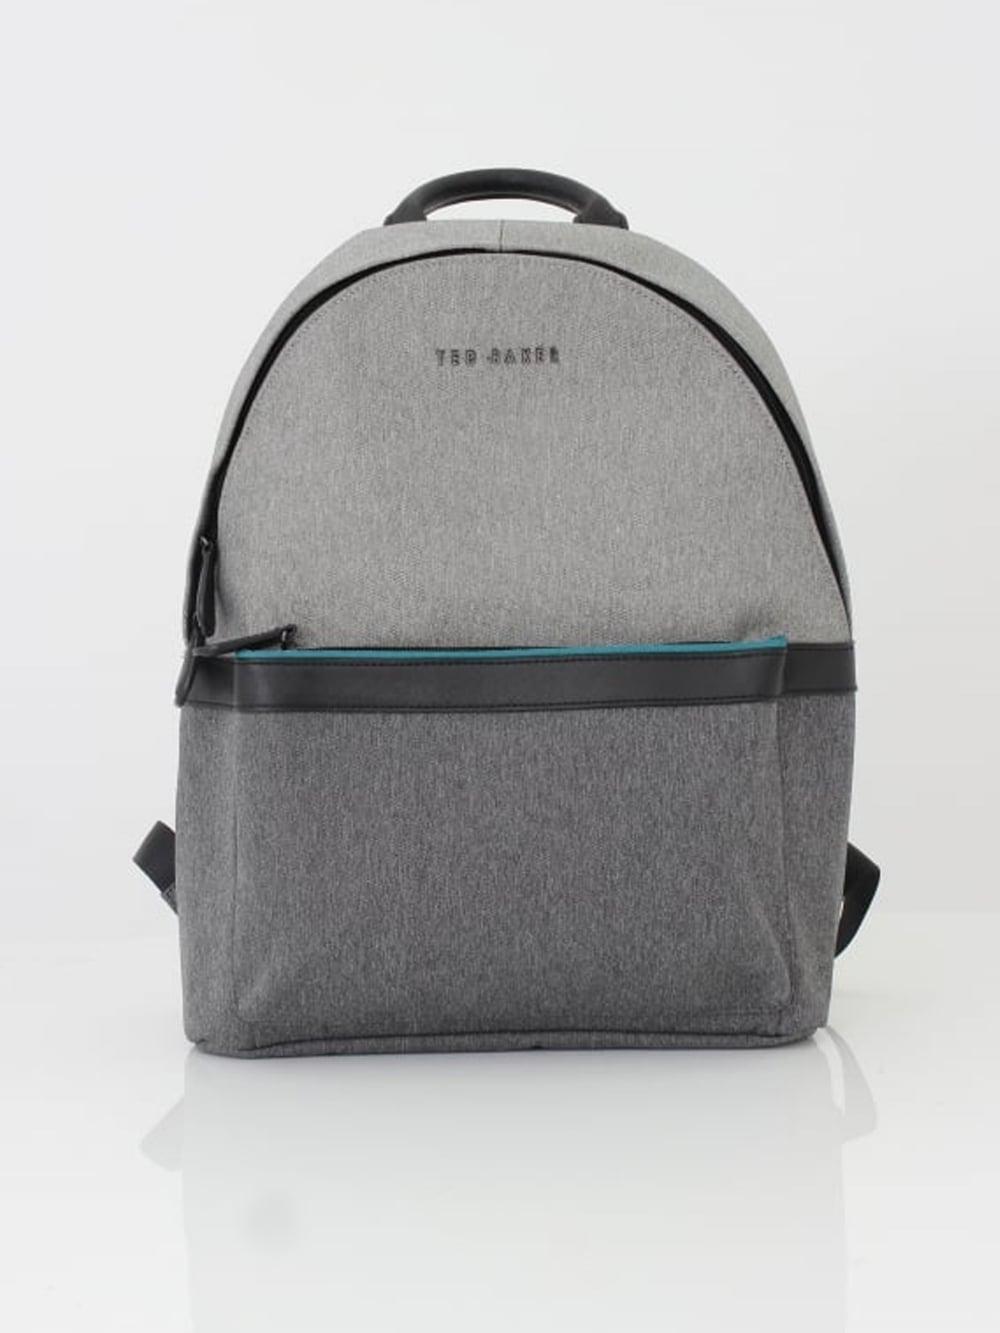 816ea05d5e Zirabi Contrast Trim Backpack - Grey